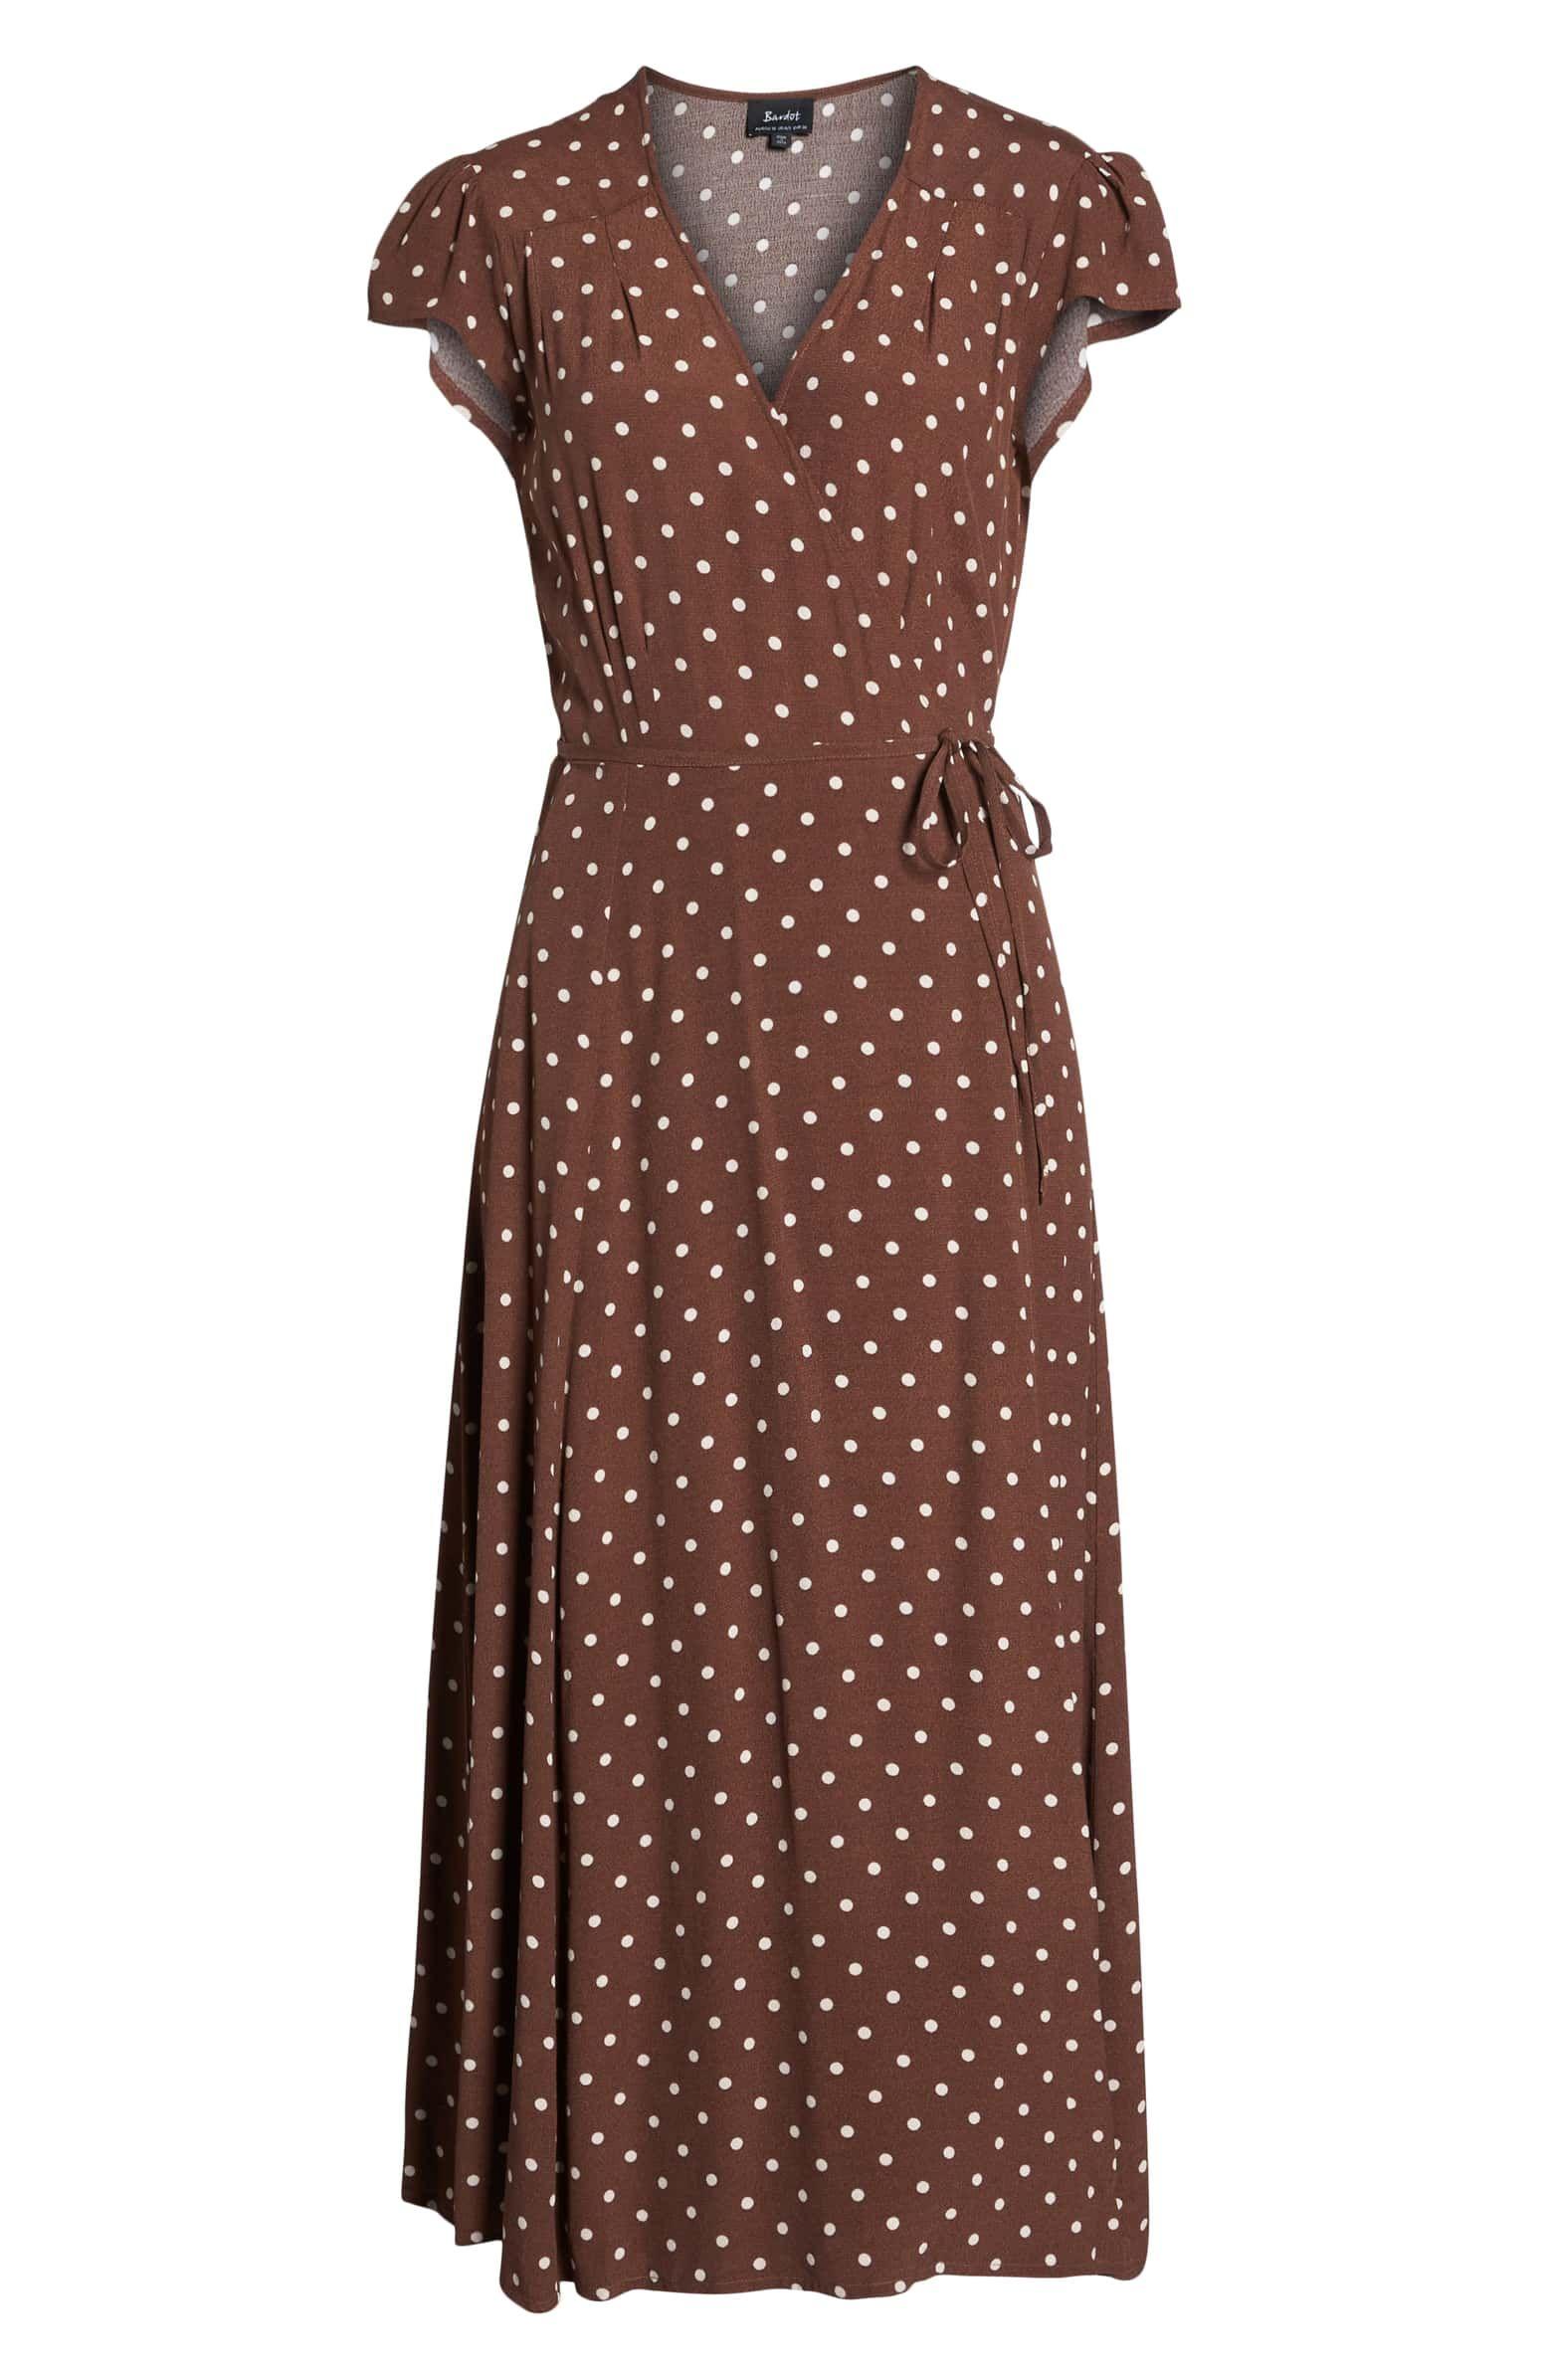 Bardot Polka Dot Wrap Dress Nordstrom Dresses Wrap Dress Nordstrom Dresses [ 2392 x 1560 Pixel ]